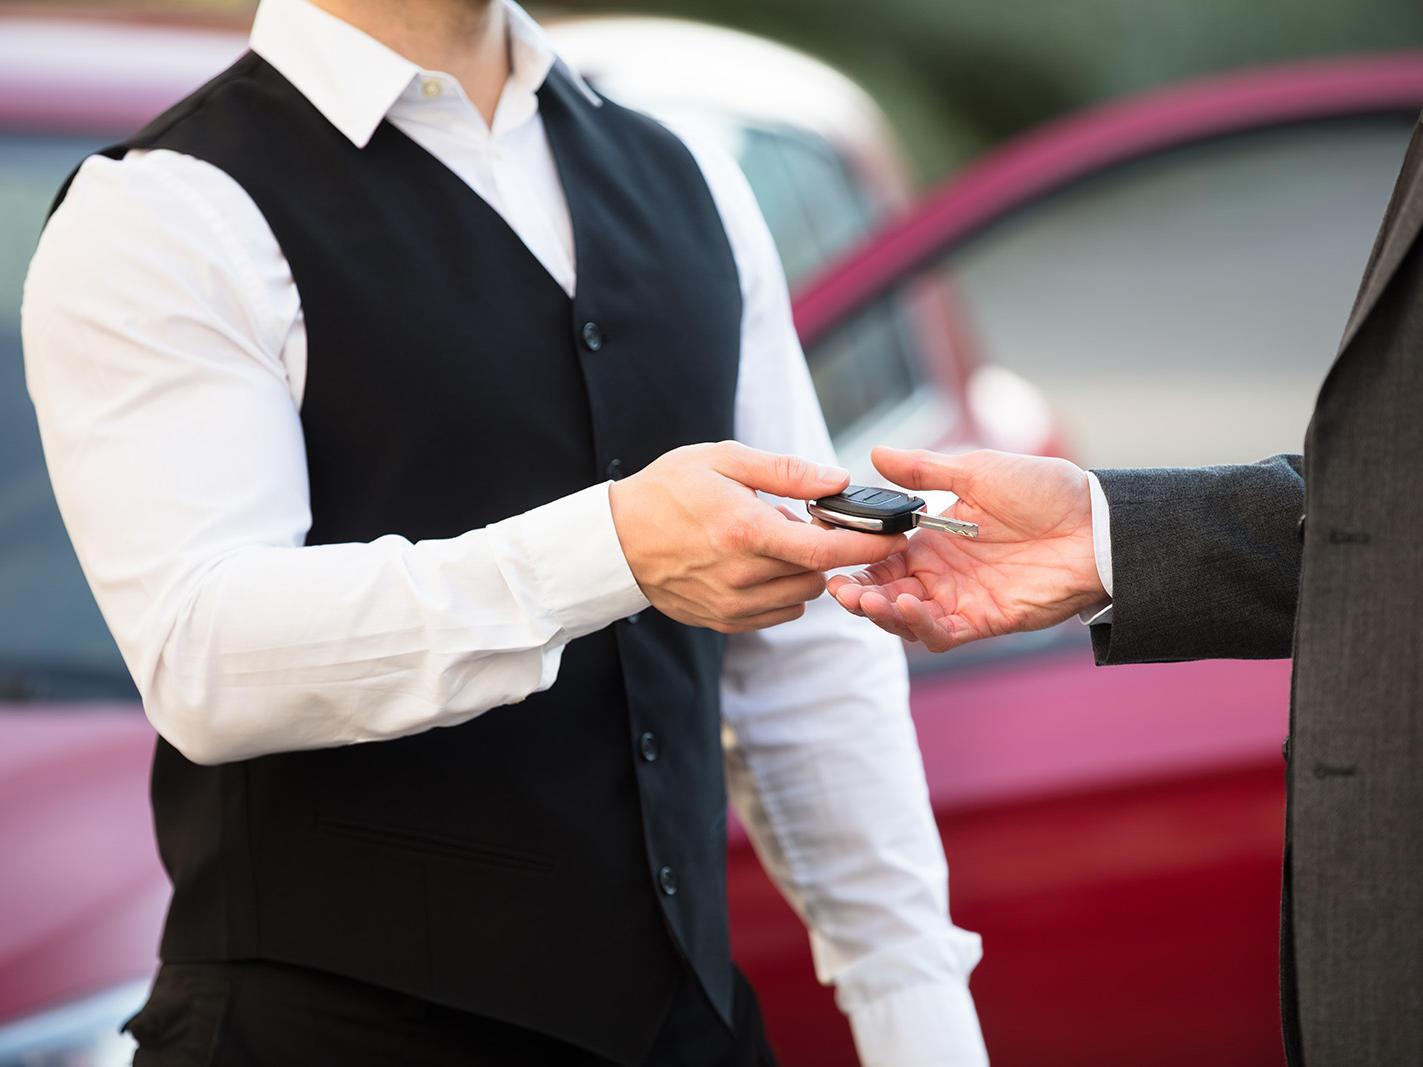 Staff member handing over keys to a customer at Valet Parking in Wayam Mundo Imperial